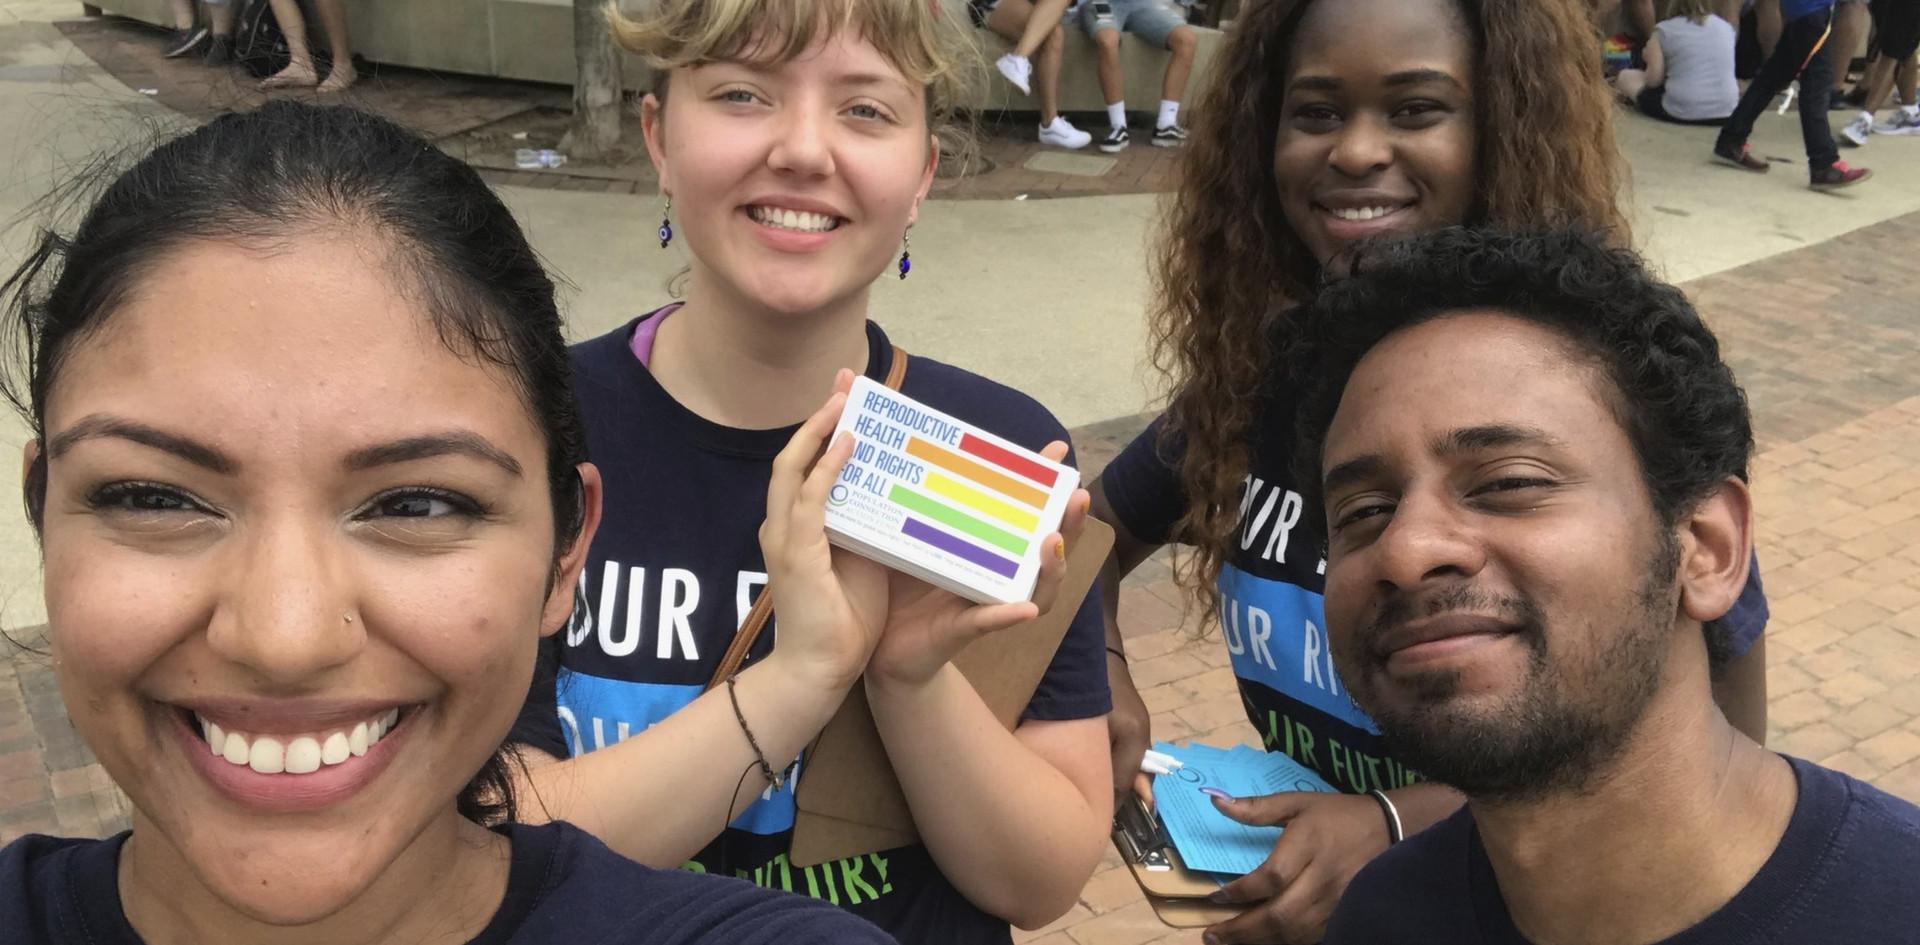 06.16.18.OH.PridePrabh(Organizer),Chloe,